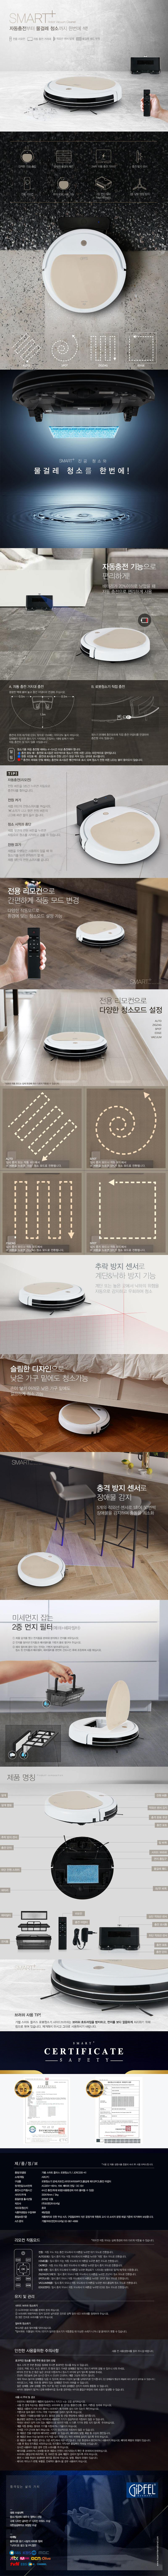 Gipfel_Smart_Robot_Vacuum_Detail.jpg